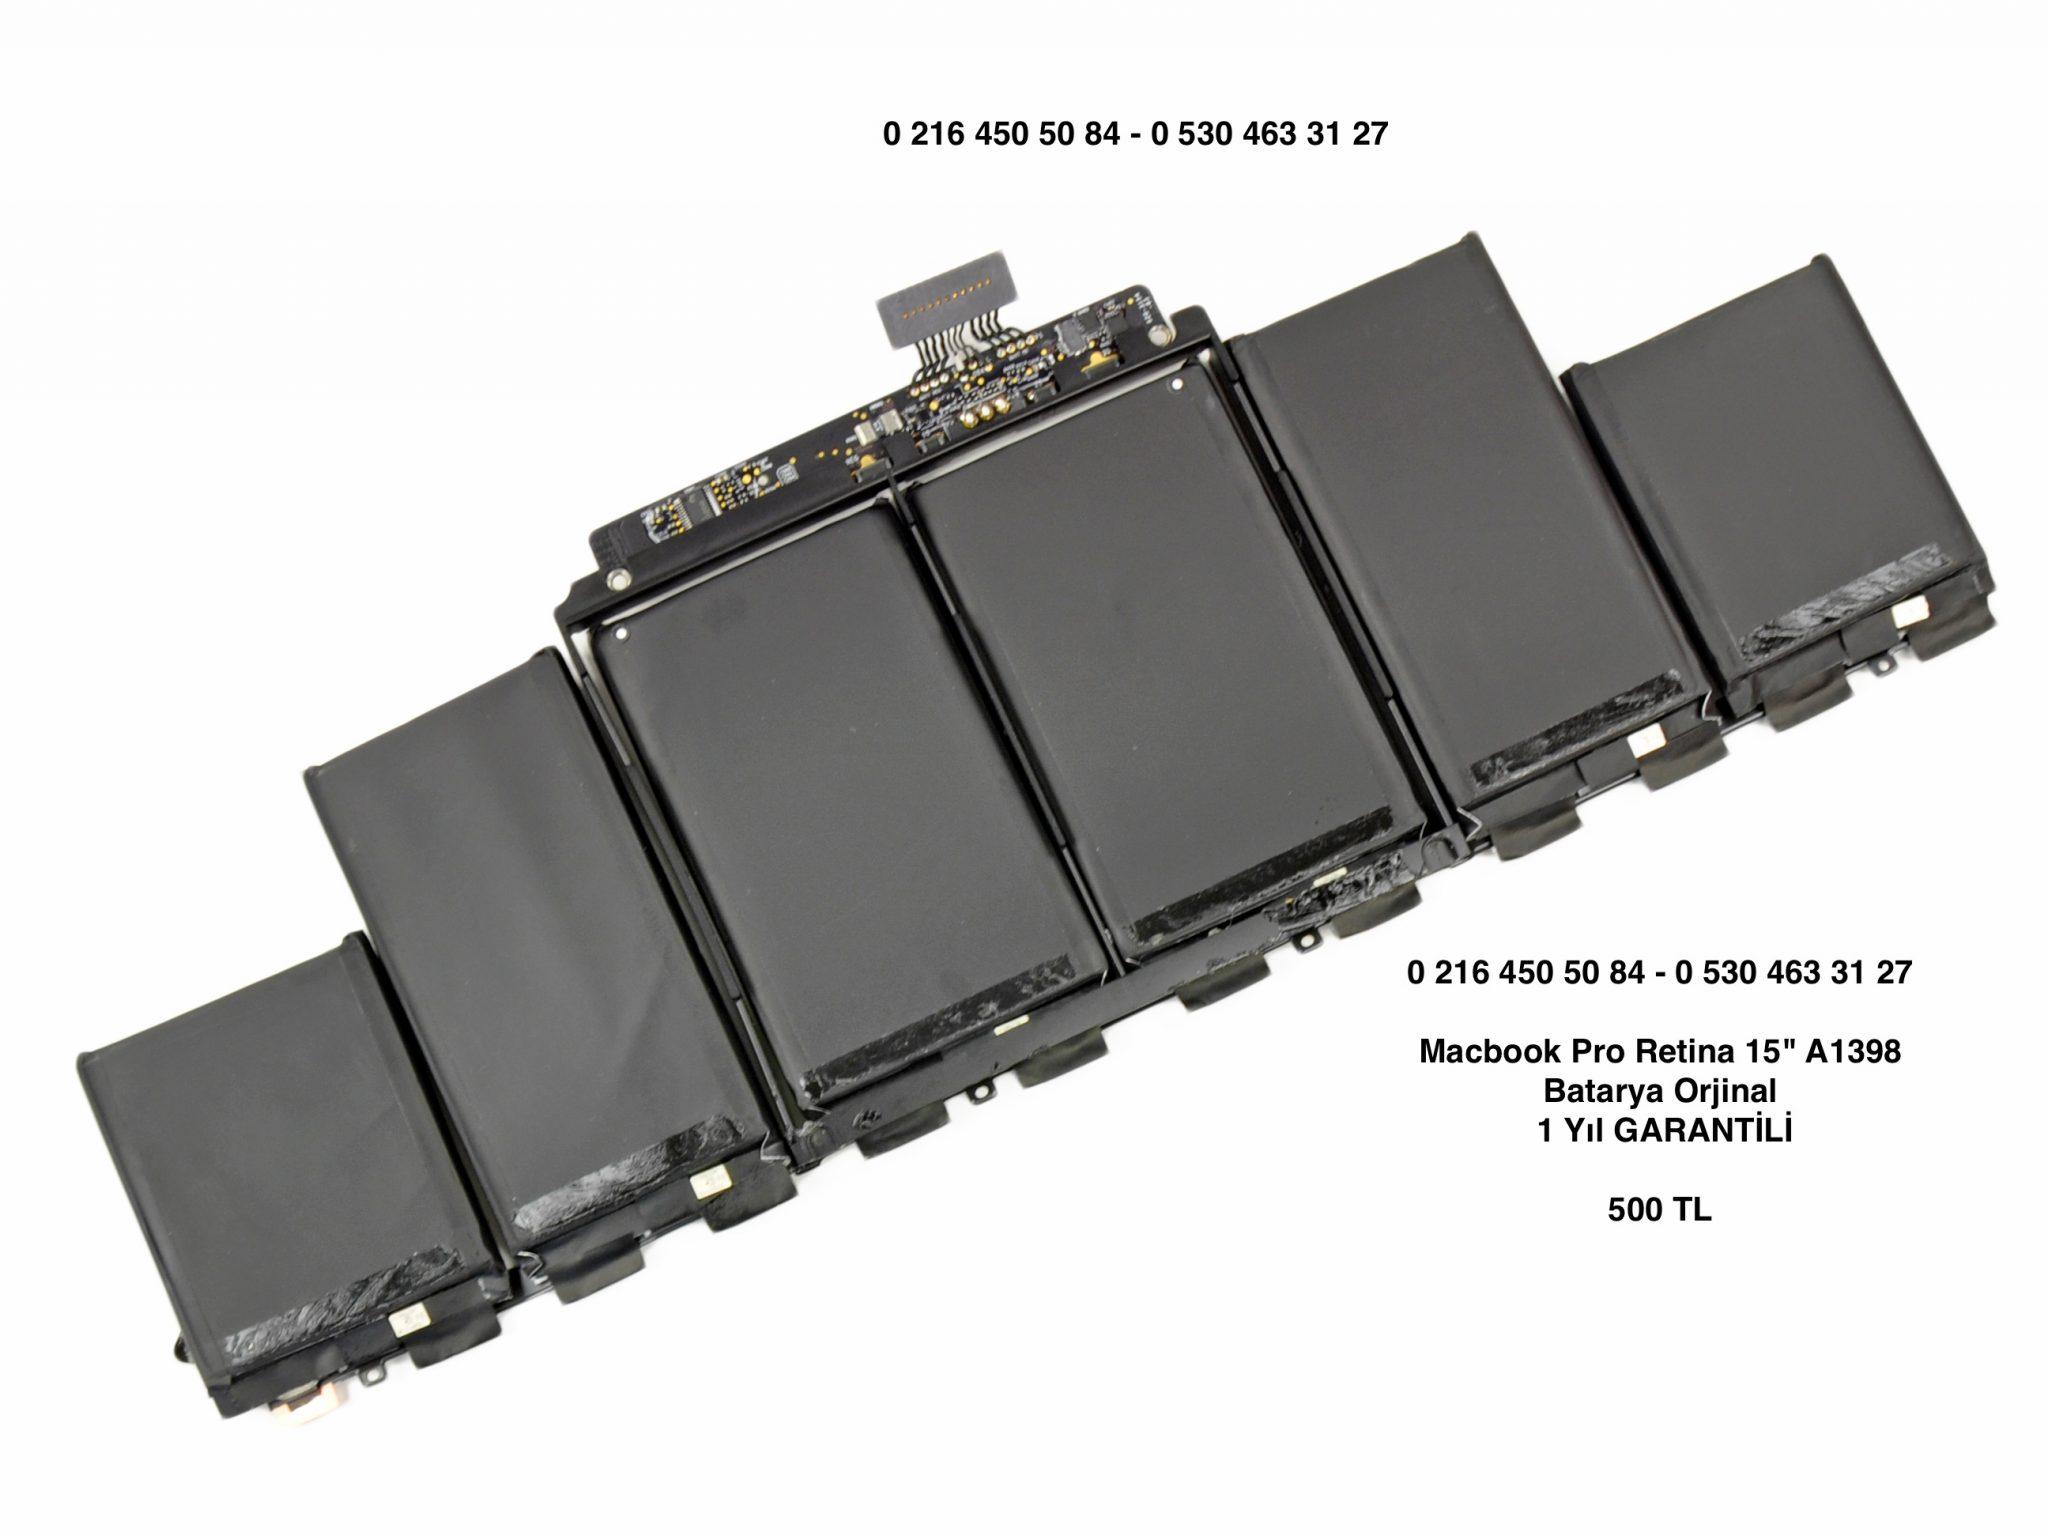 "Macbook Pro Retina 15"" A1398 Batarya Orjinal 1 Yıl GARANTİLİ"